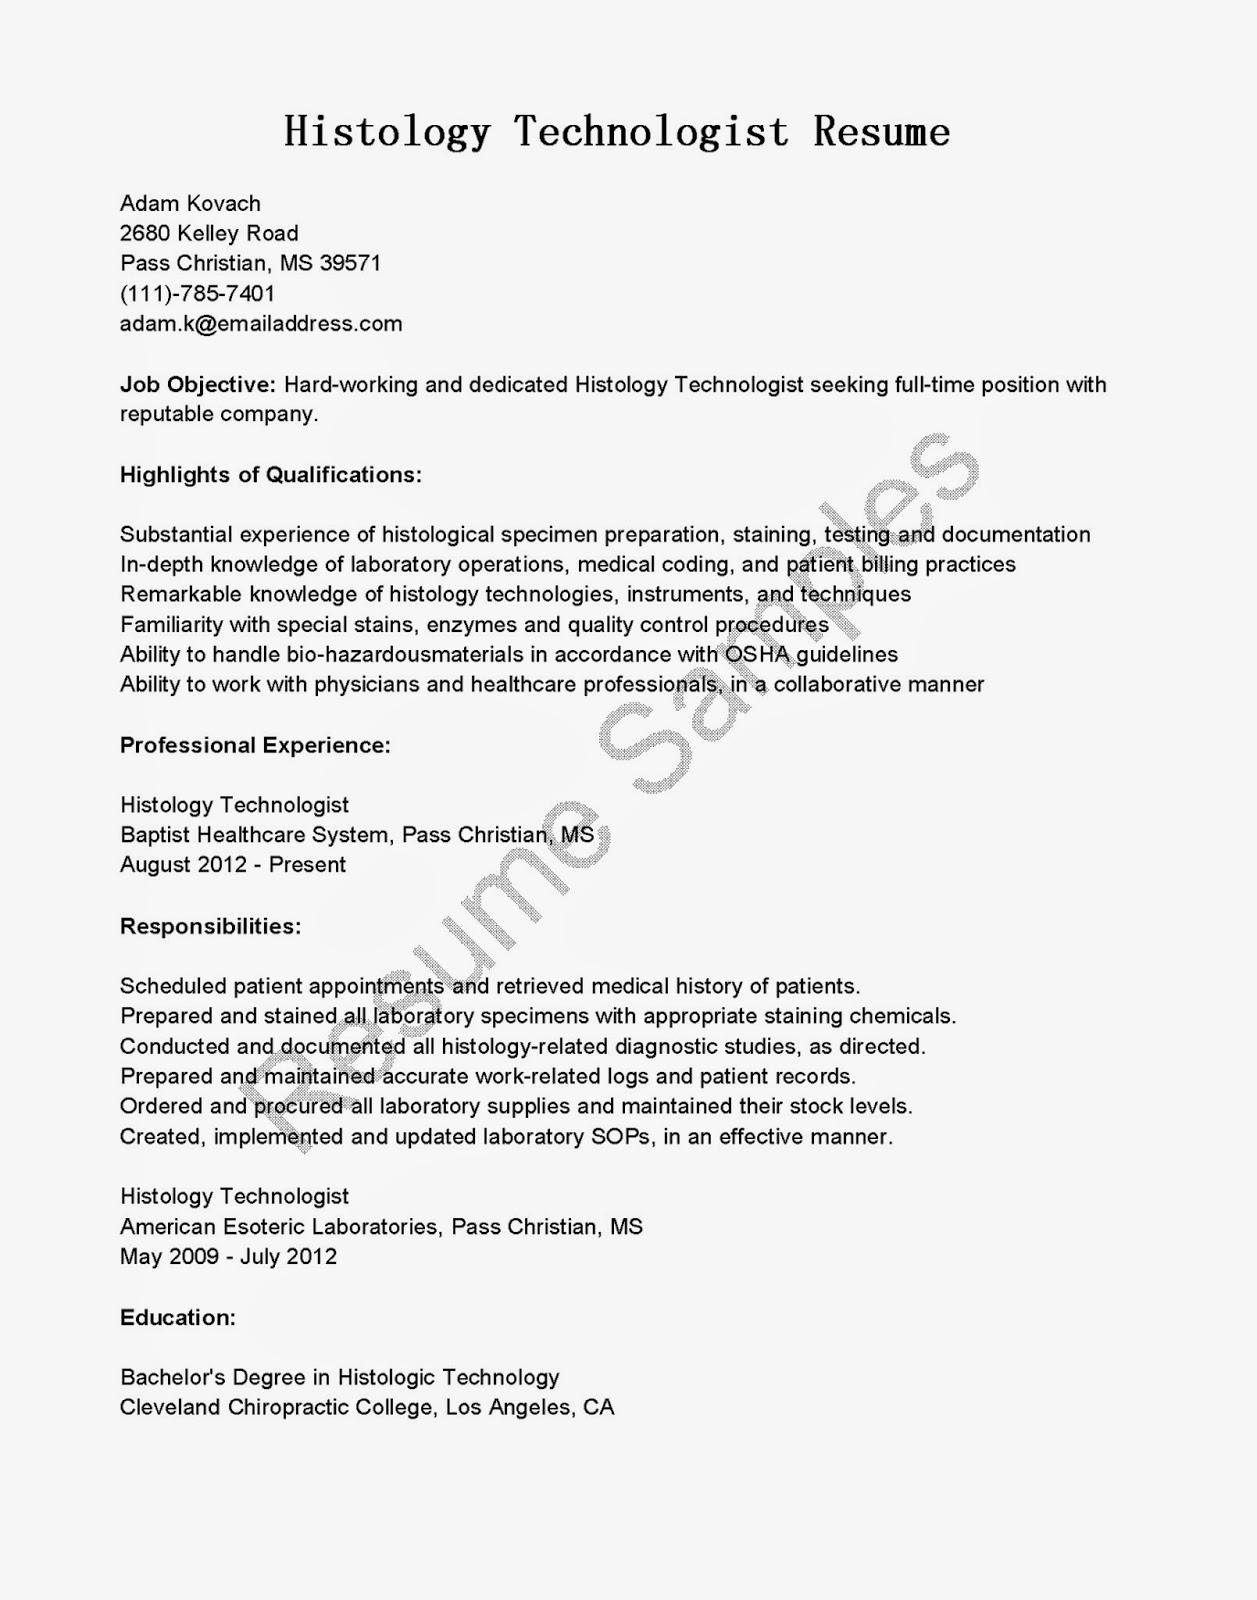 Resume writing services peoria il